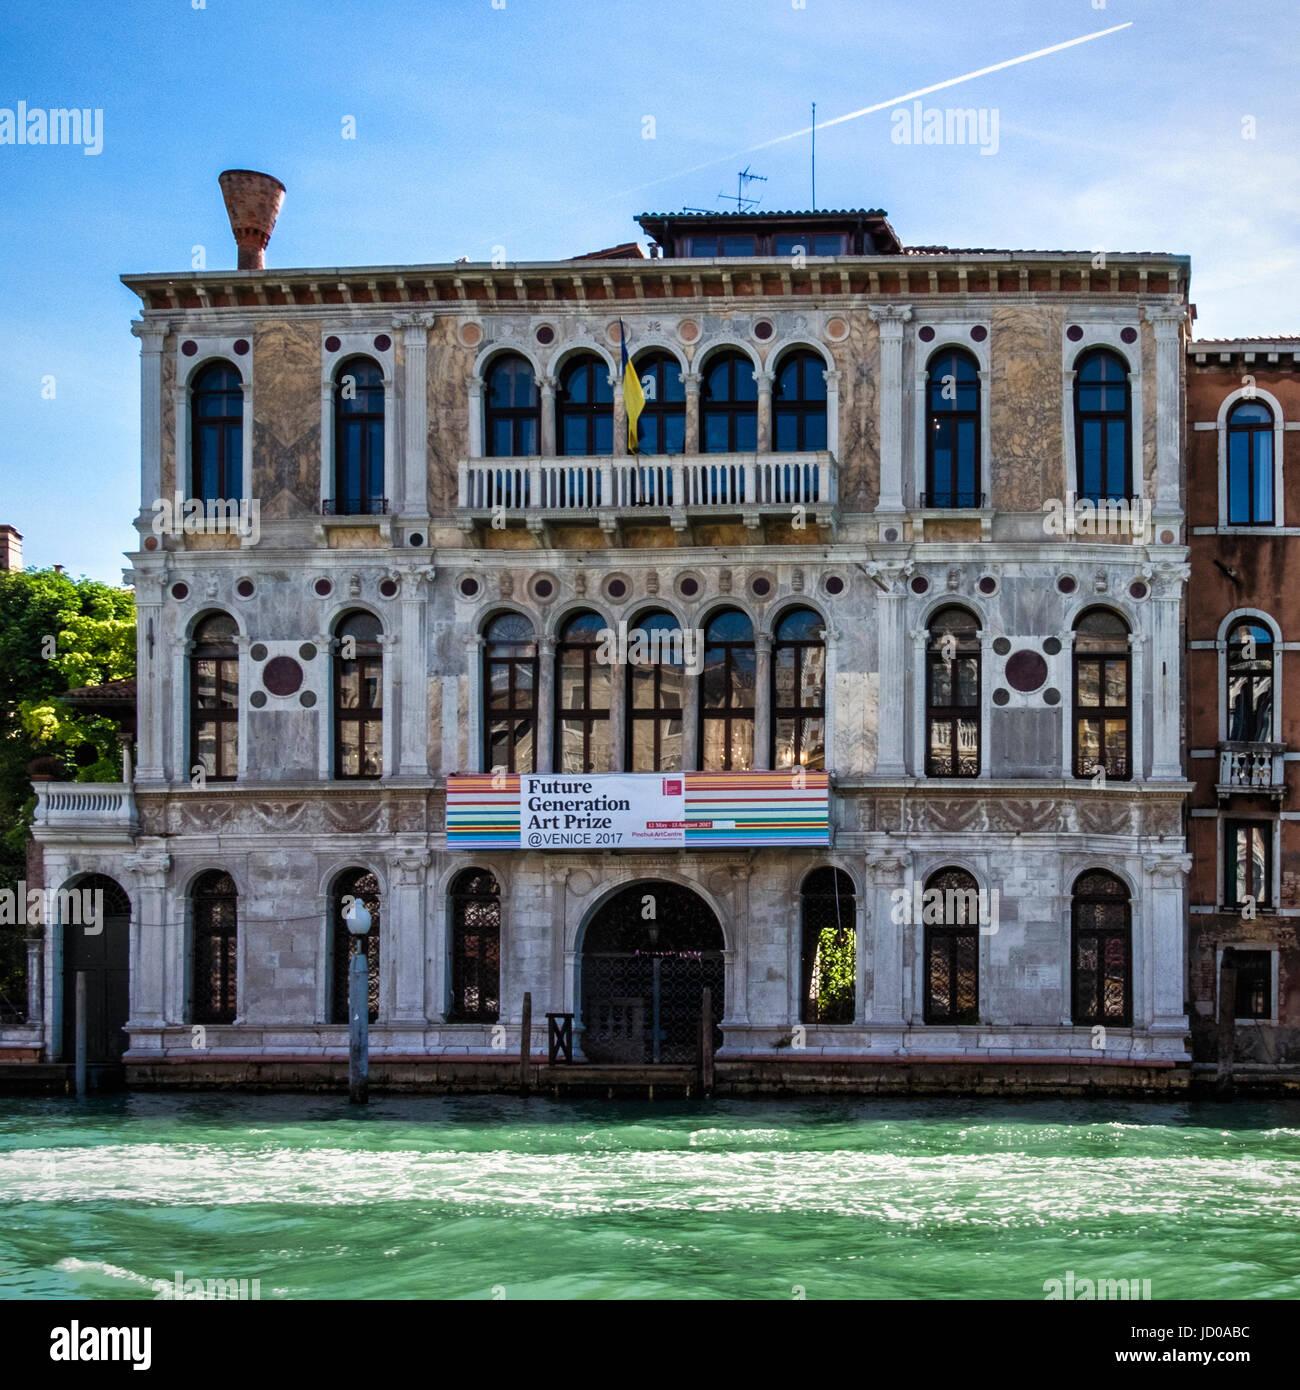 Venice Italy.  Dorsoduro Historic Palazzo Contiarini  Polignac.Palace building exterior with Renaisance facade - Stock Image